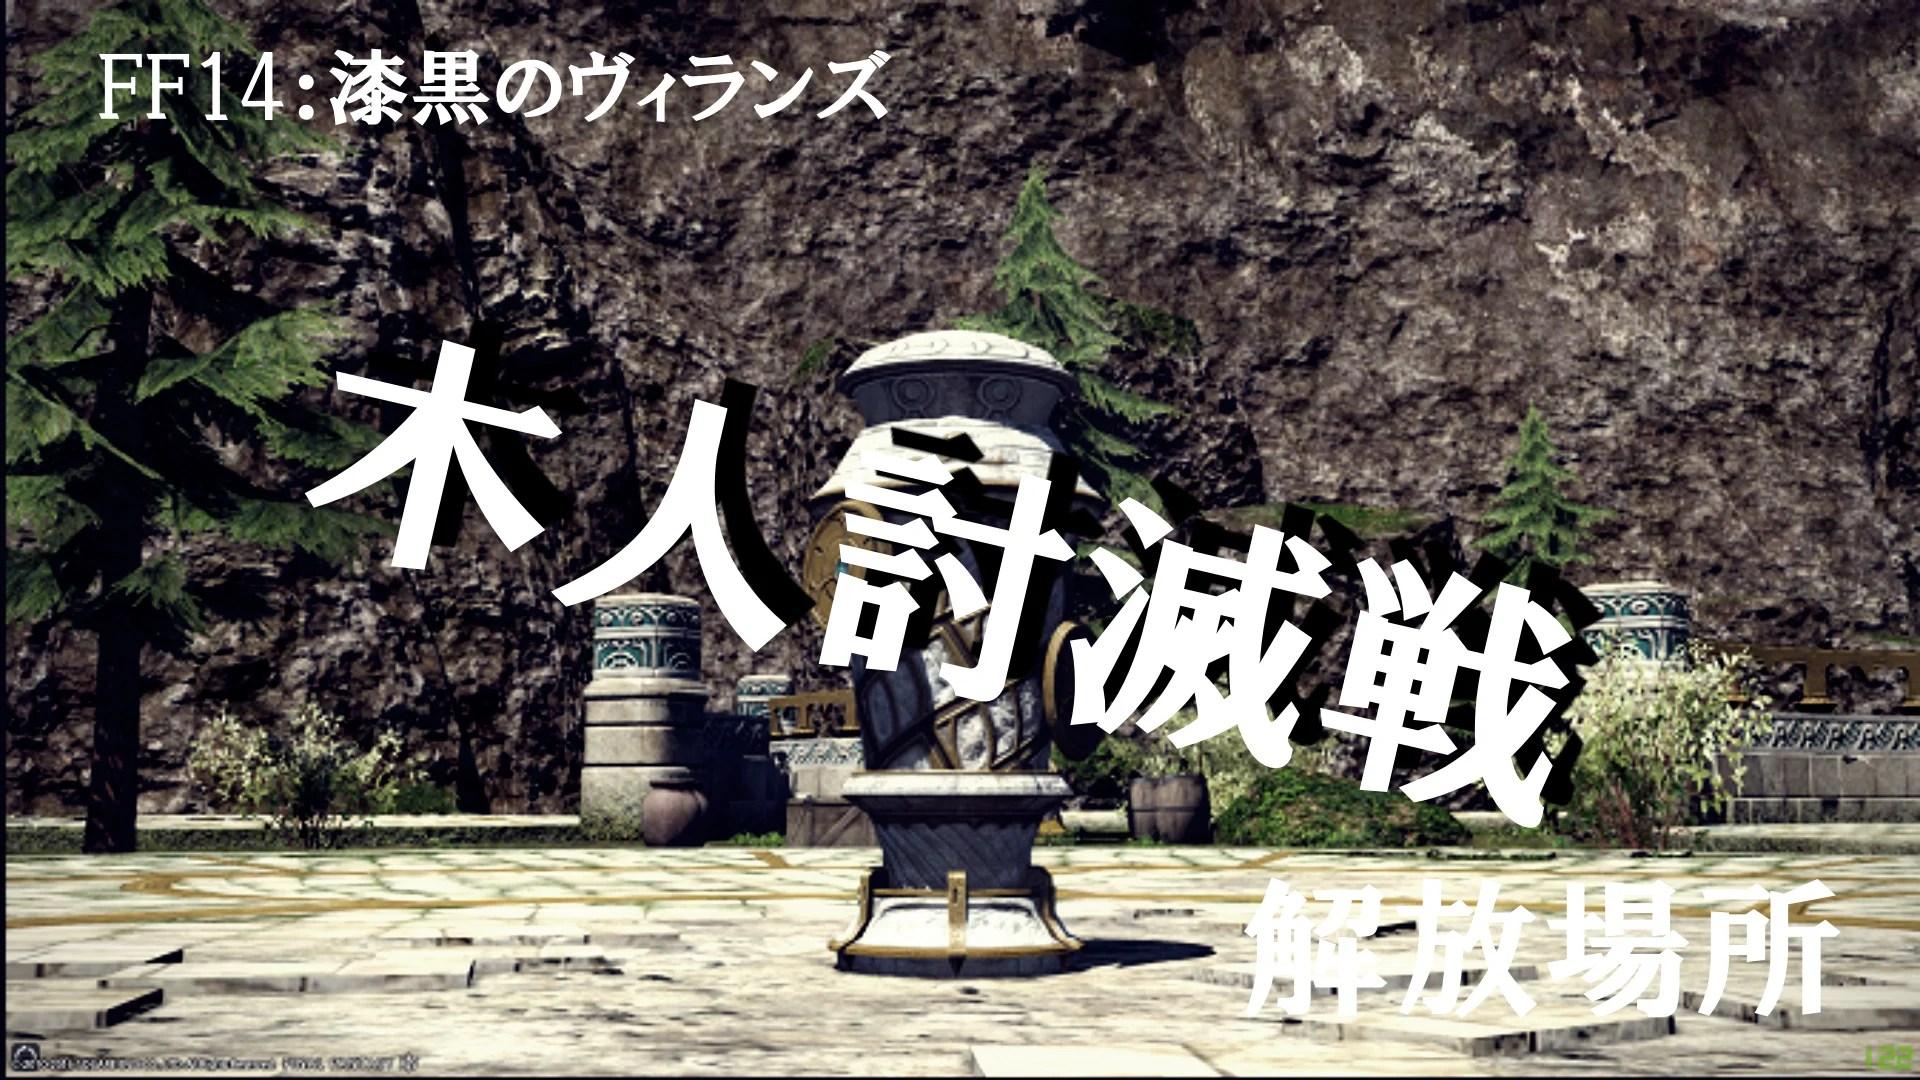 【FF14】5.0木人討滅戦を解放してスキル回しをチェック!【ファイナルファンタジーXIV】